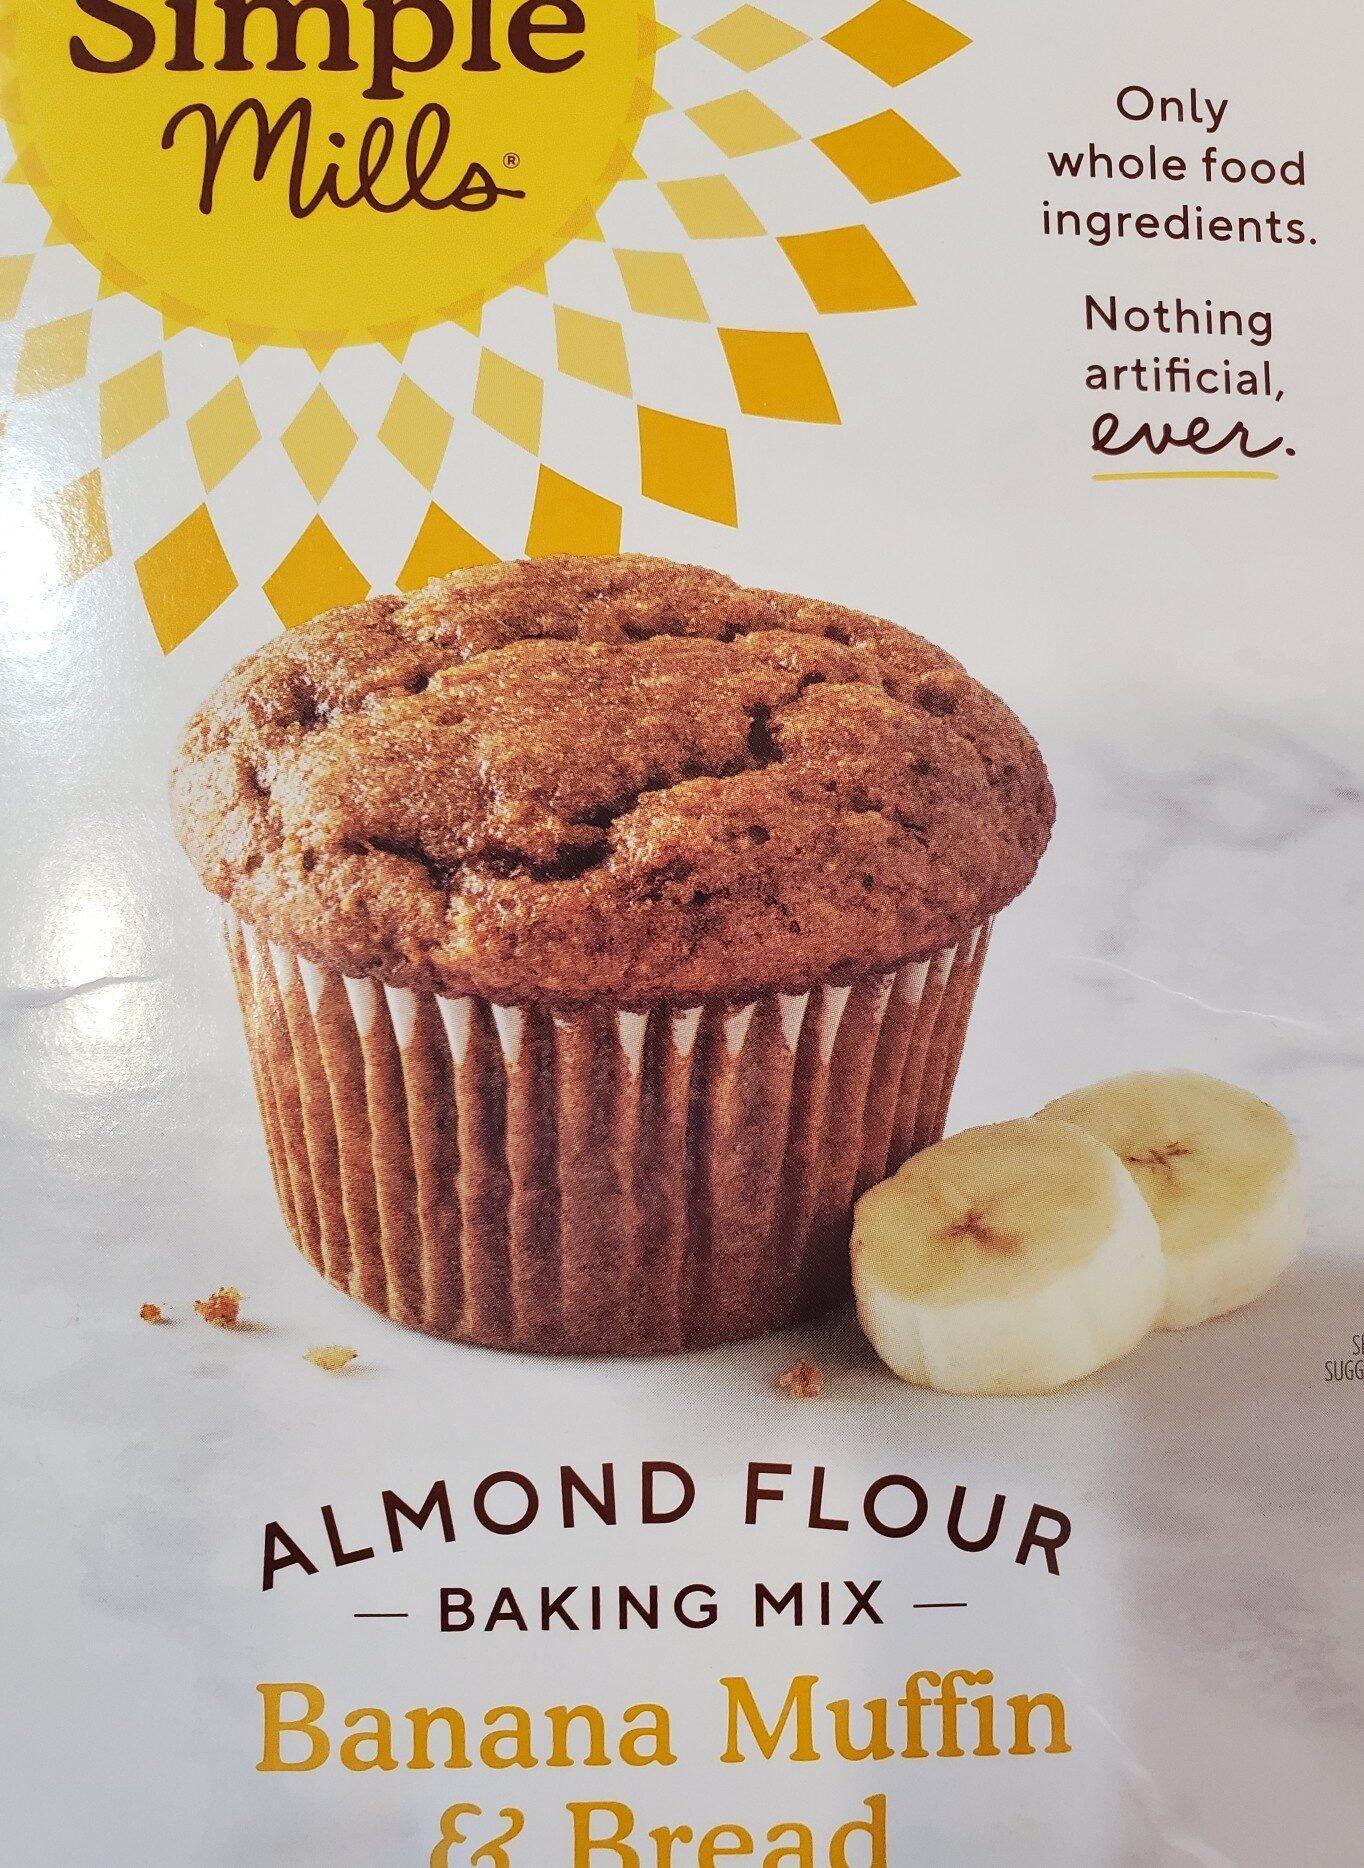 Simple mills, banana muffin - Produit - en